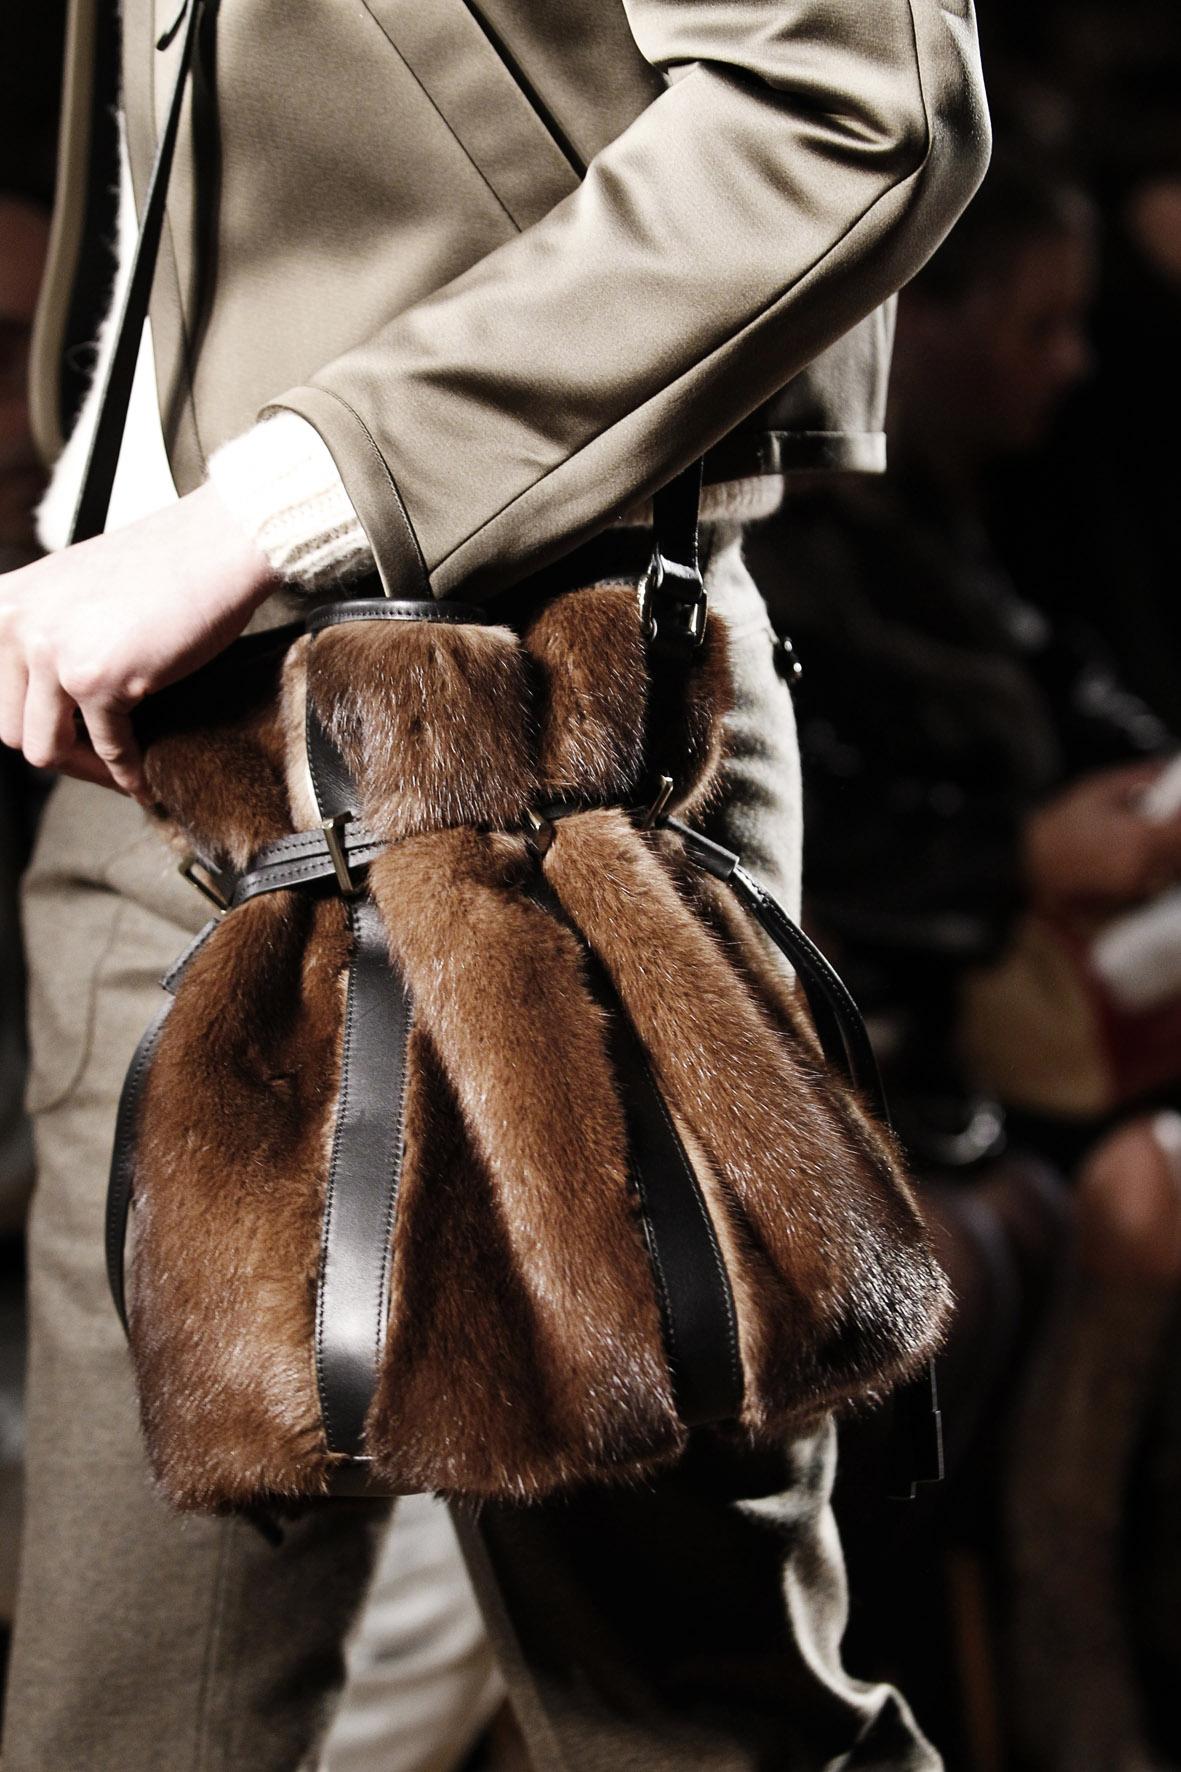 Меховая сумка от Barbara Bui